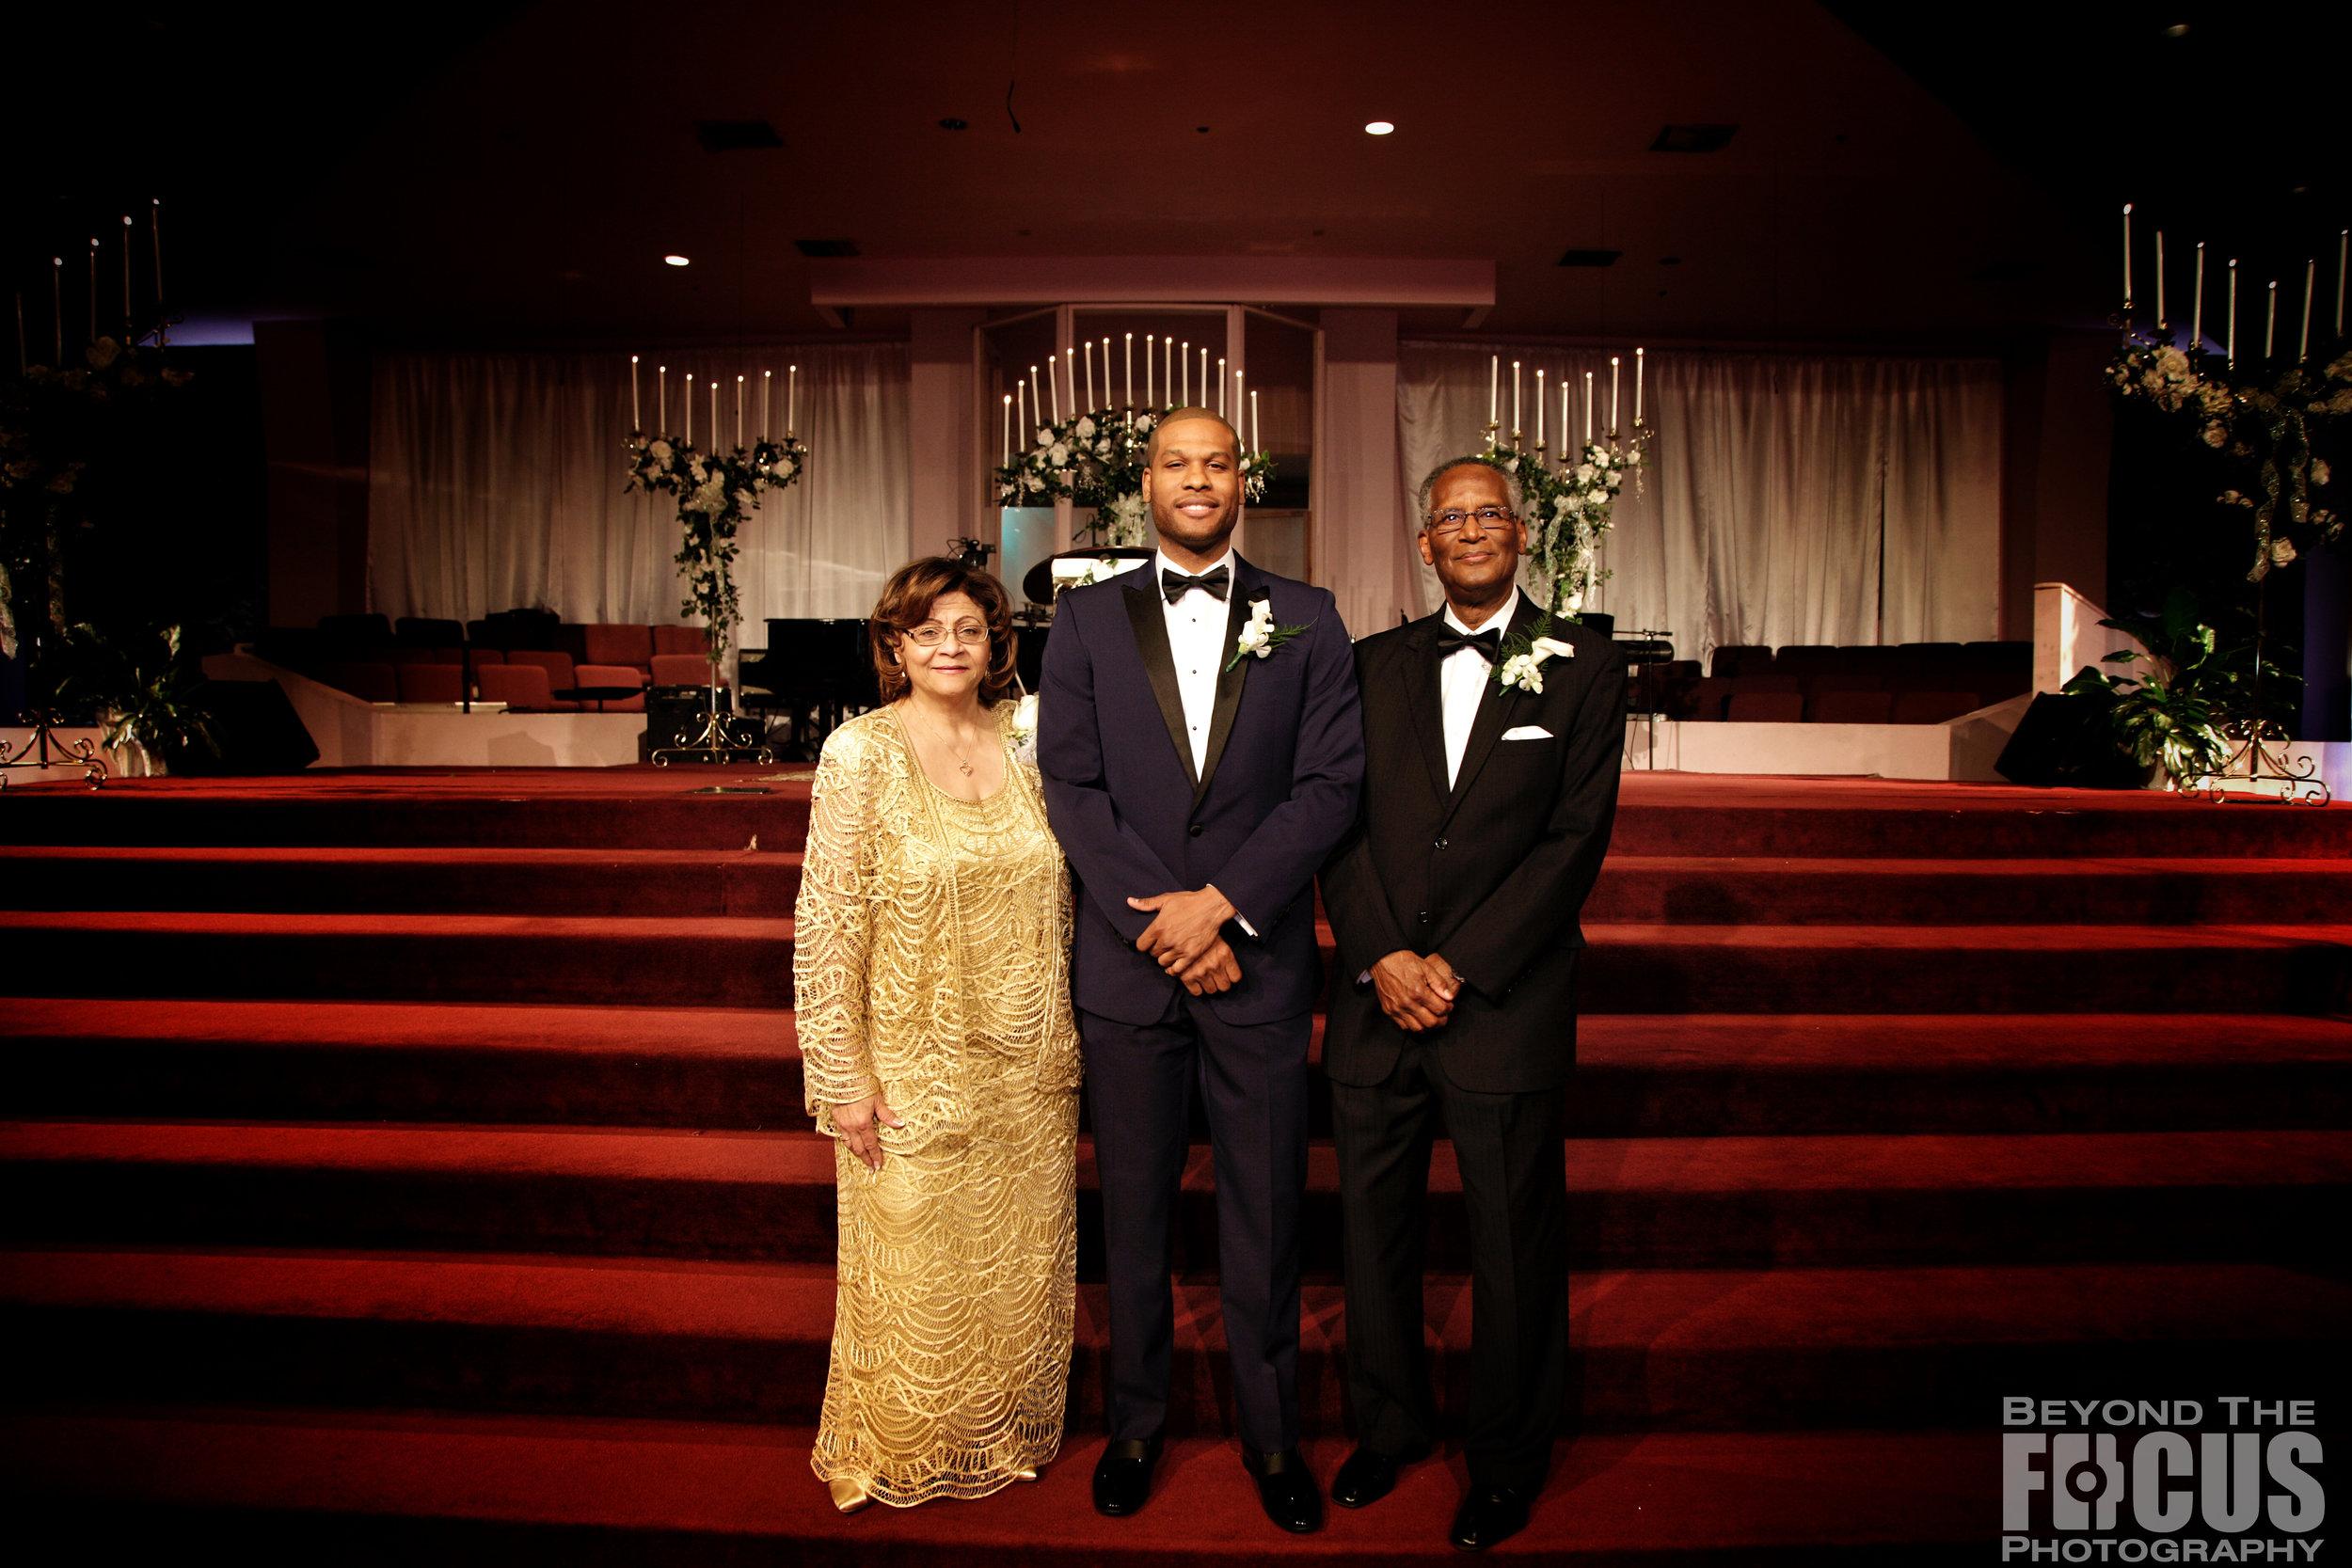 Matthews_Wedding_Ceremony_115.jpg